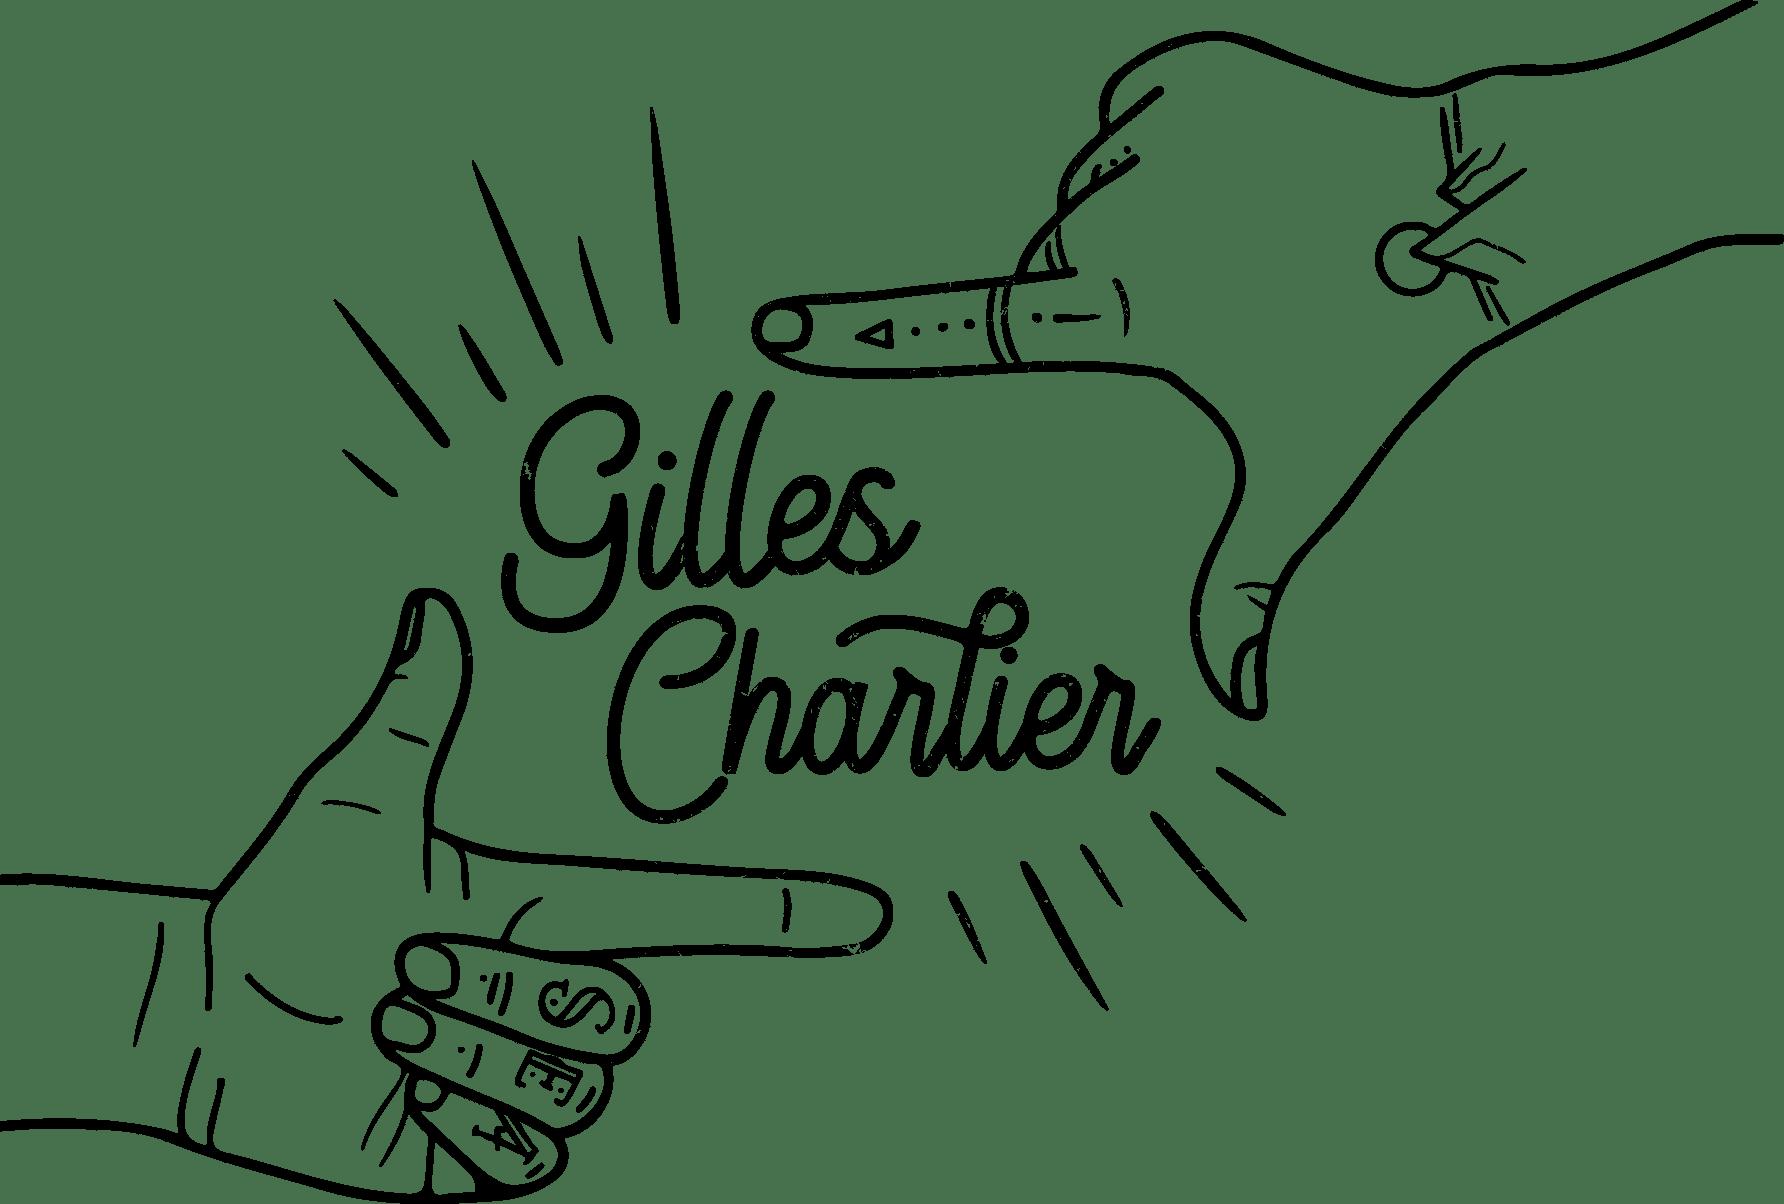 Gilles Charlier